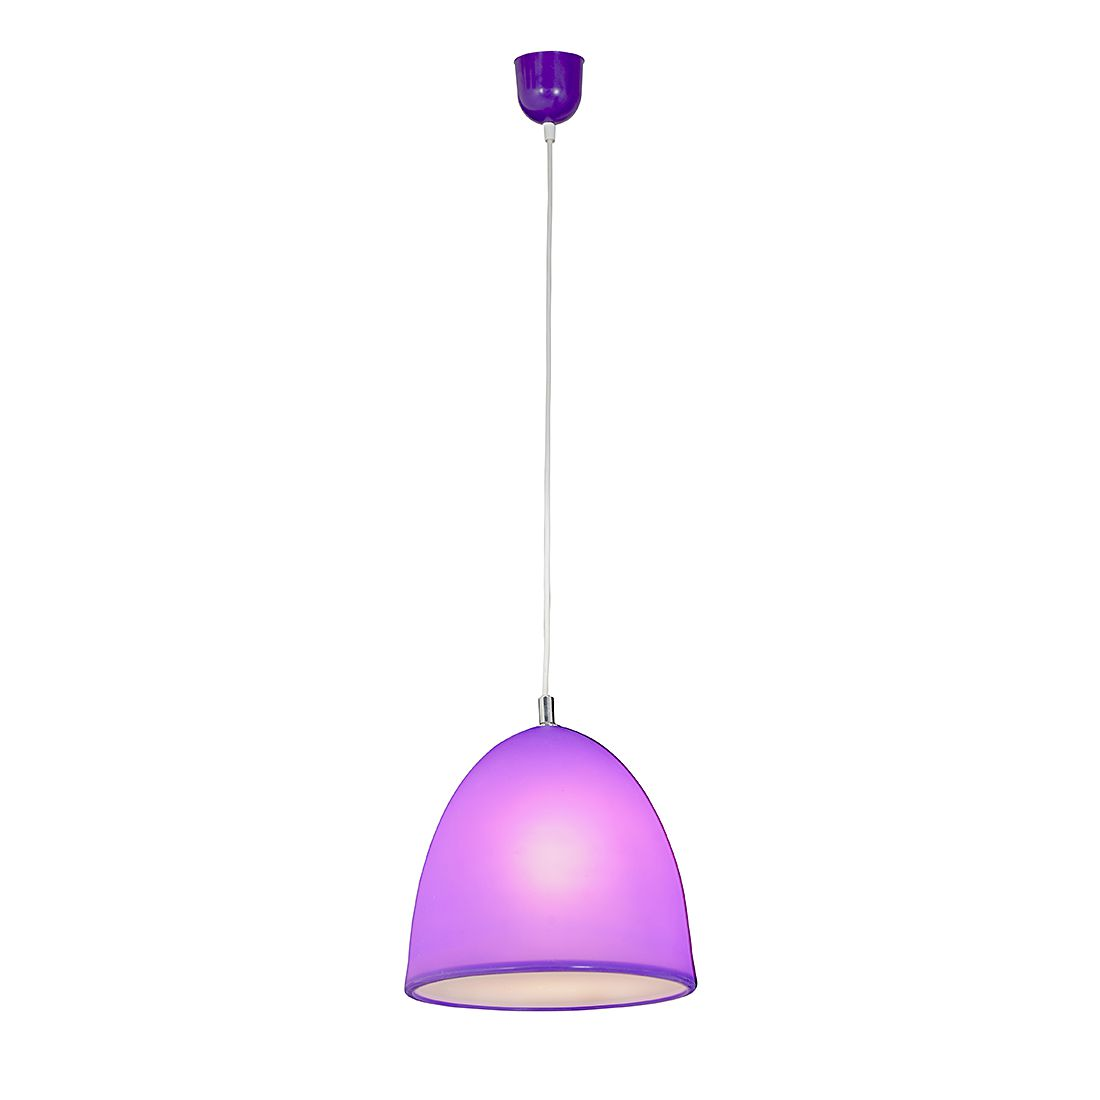 energie  A++, Hanglamp Tepsa - silicone - 1 lichtbron - Paars, Näve